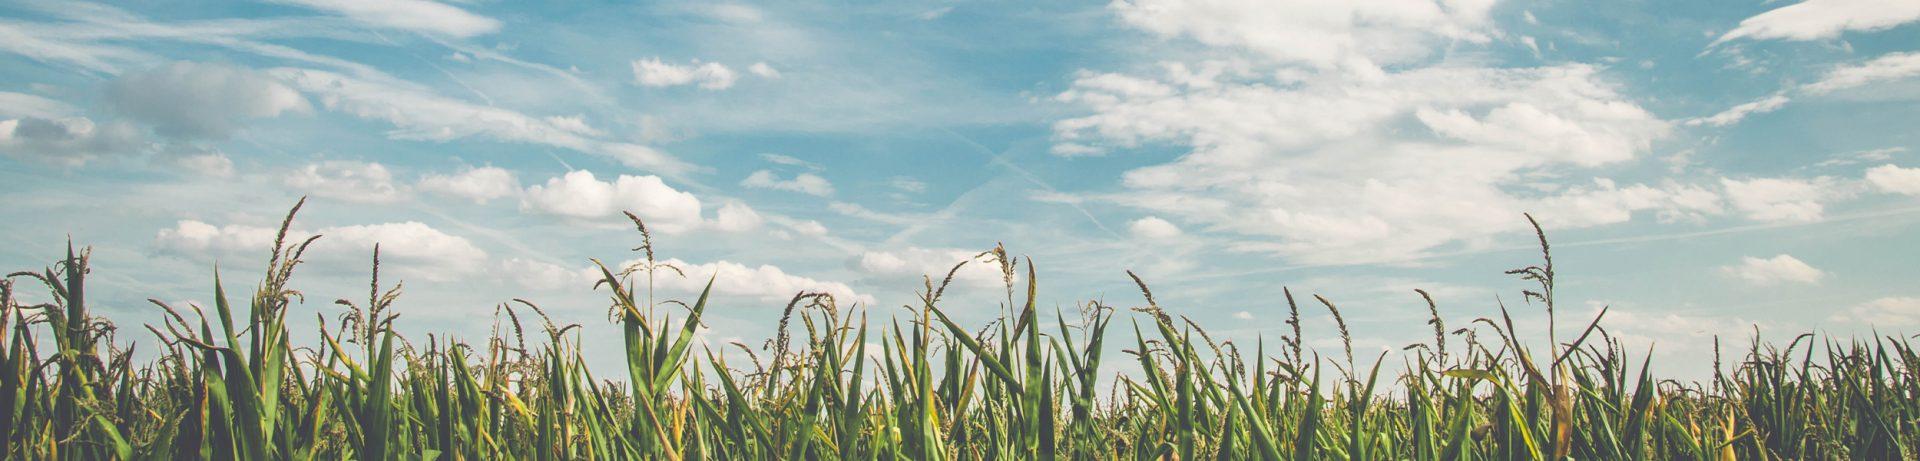 AHV field with corn